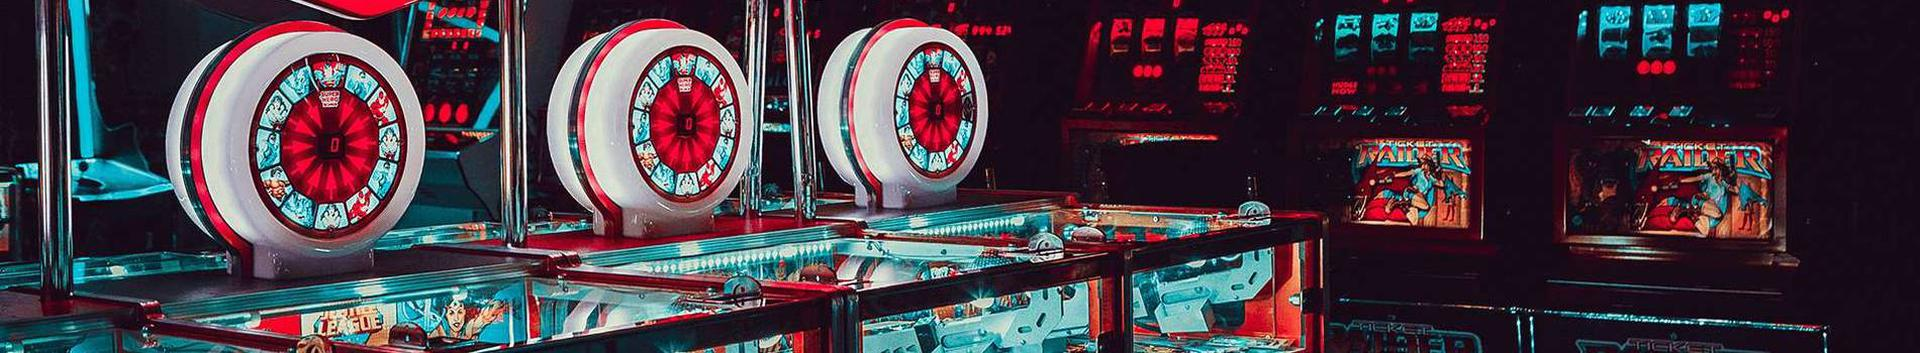 hasartmängud, hasartmängude korraldamine